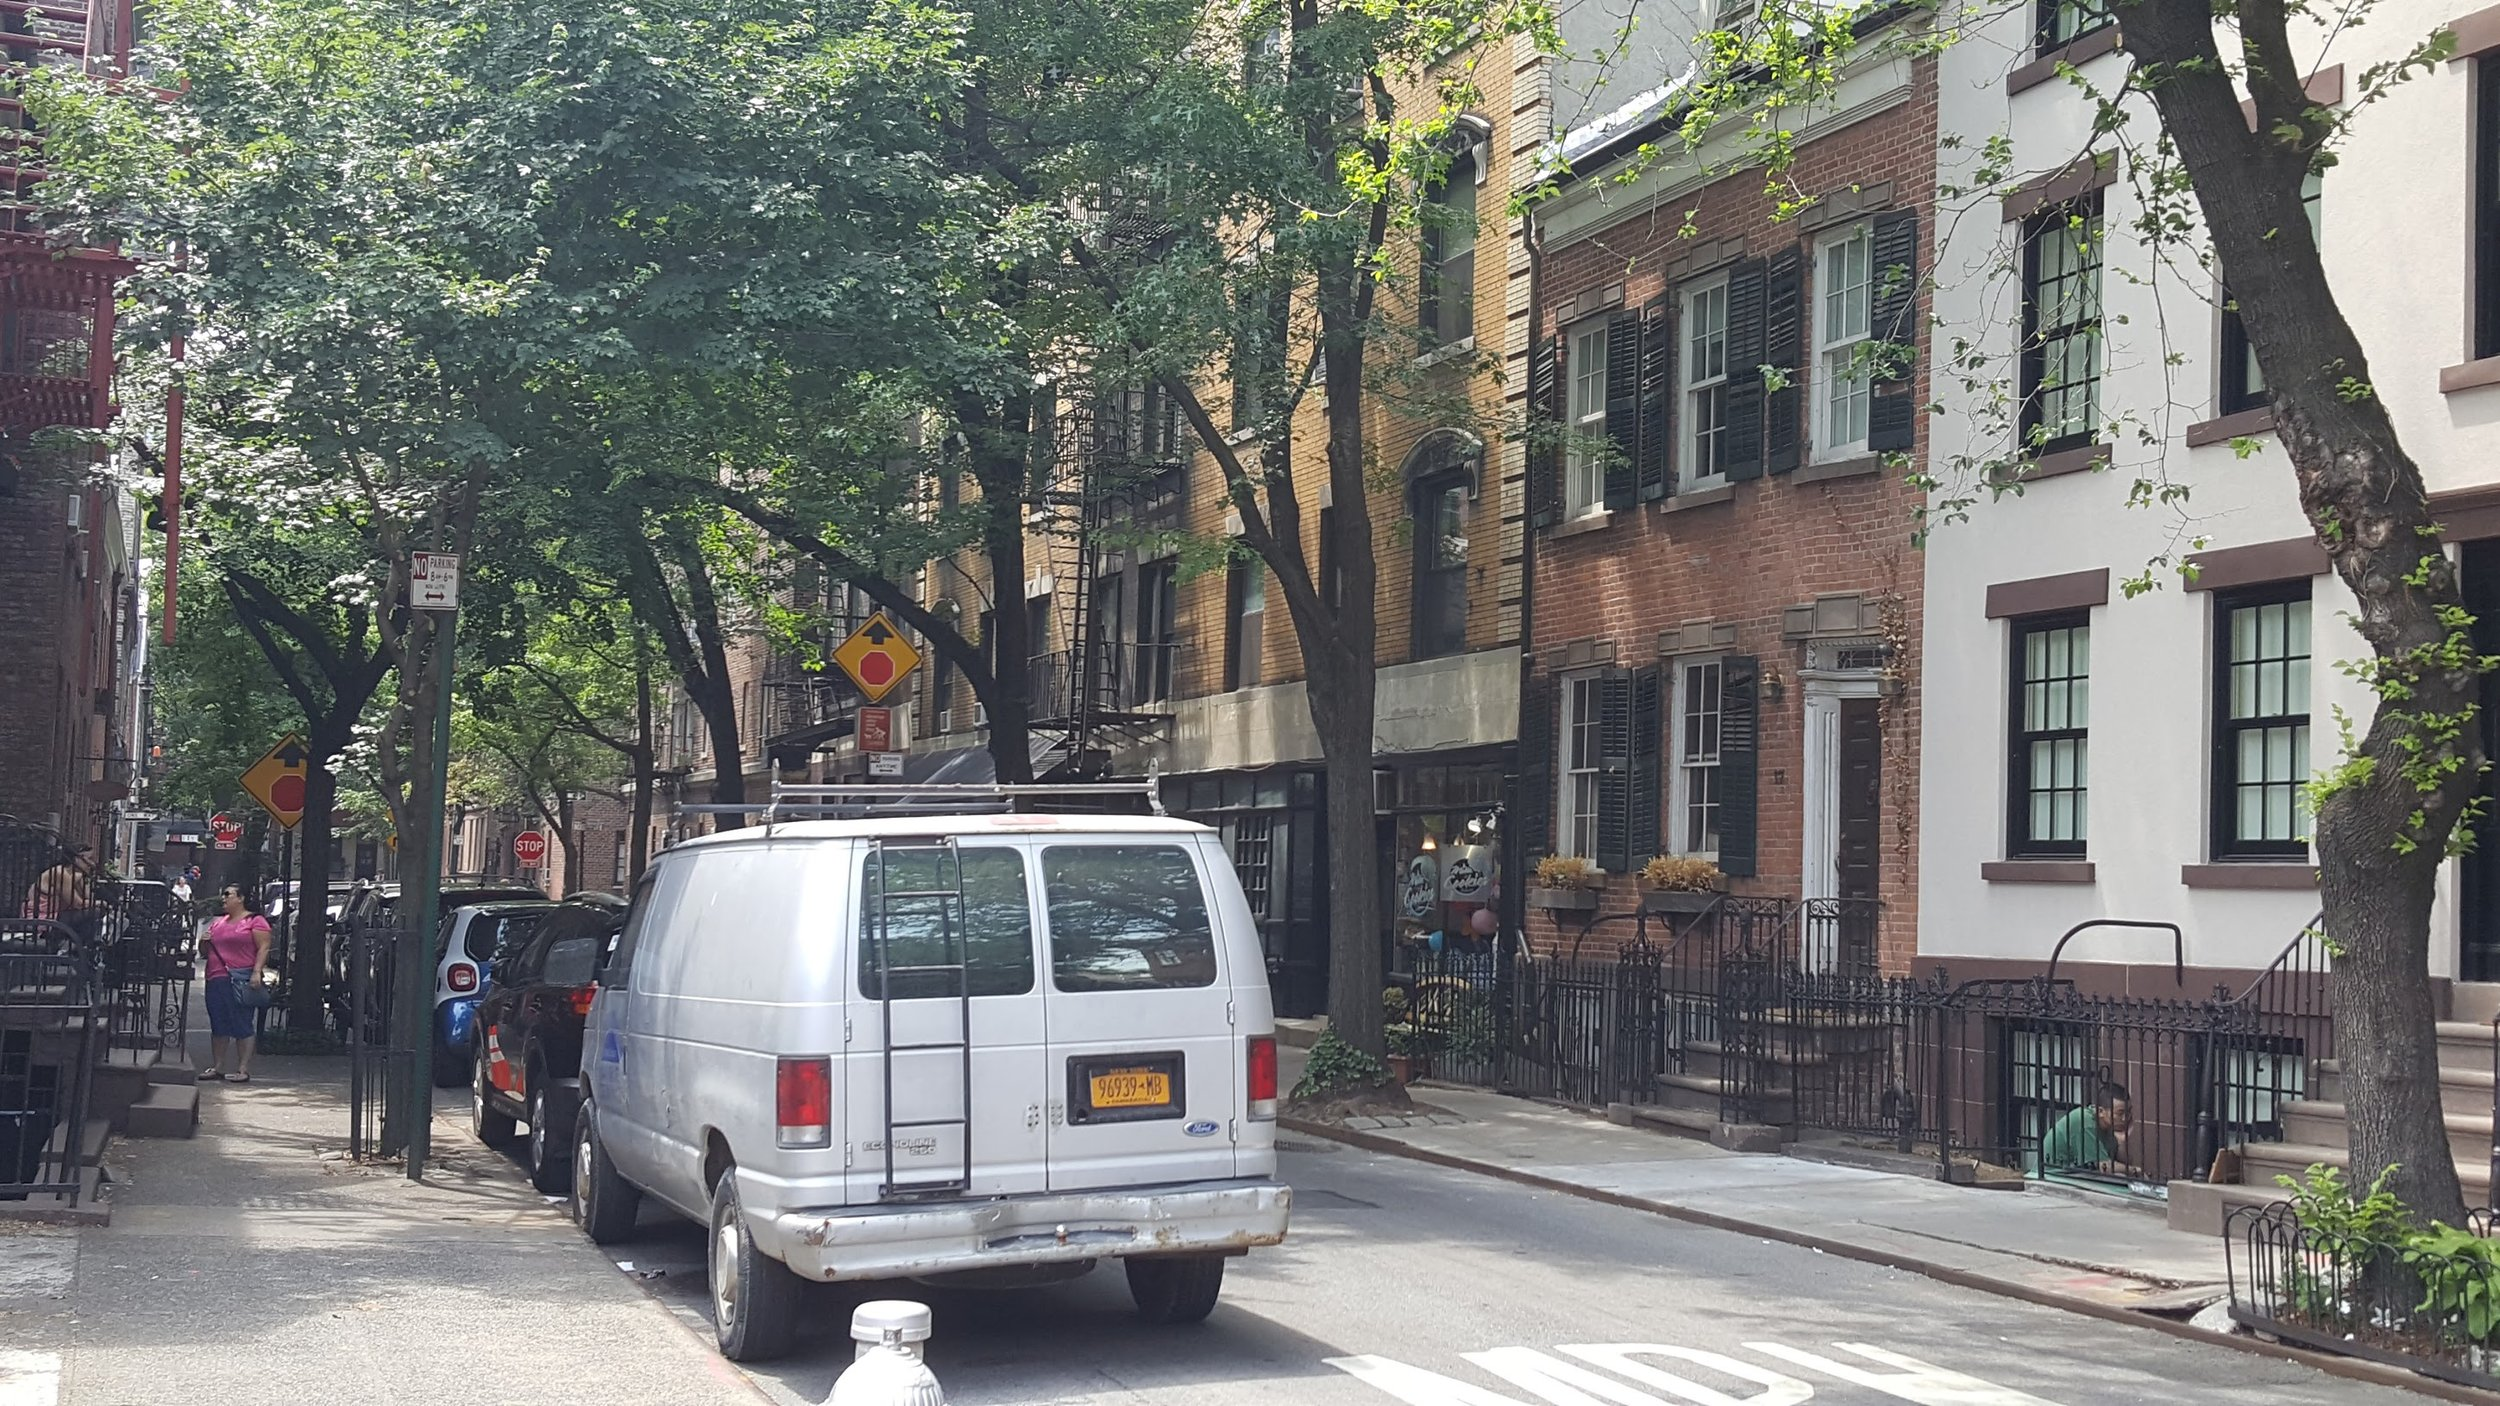 Brick townhomes of West Village.